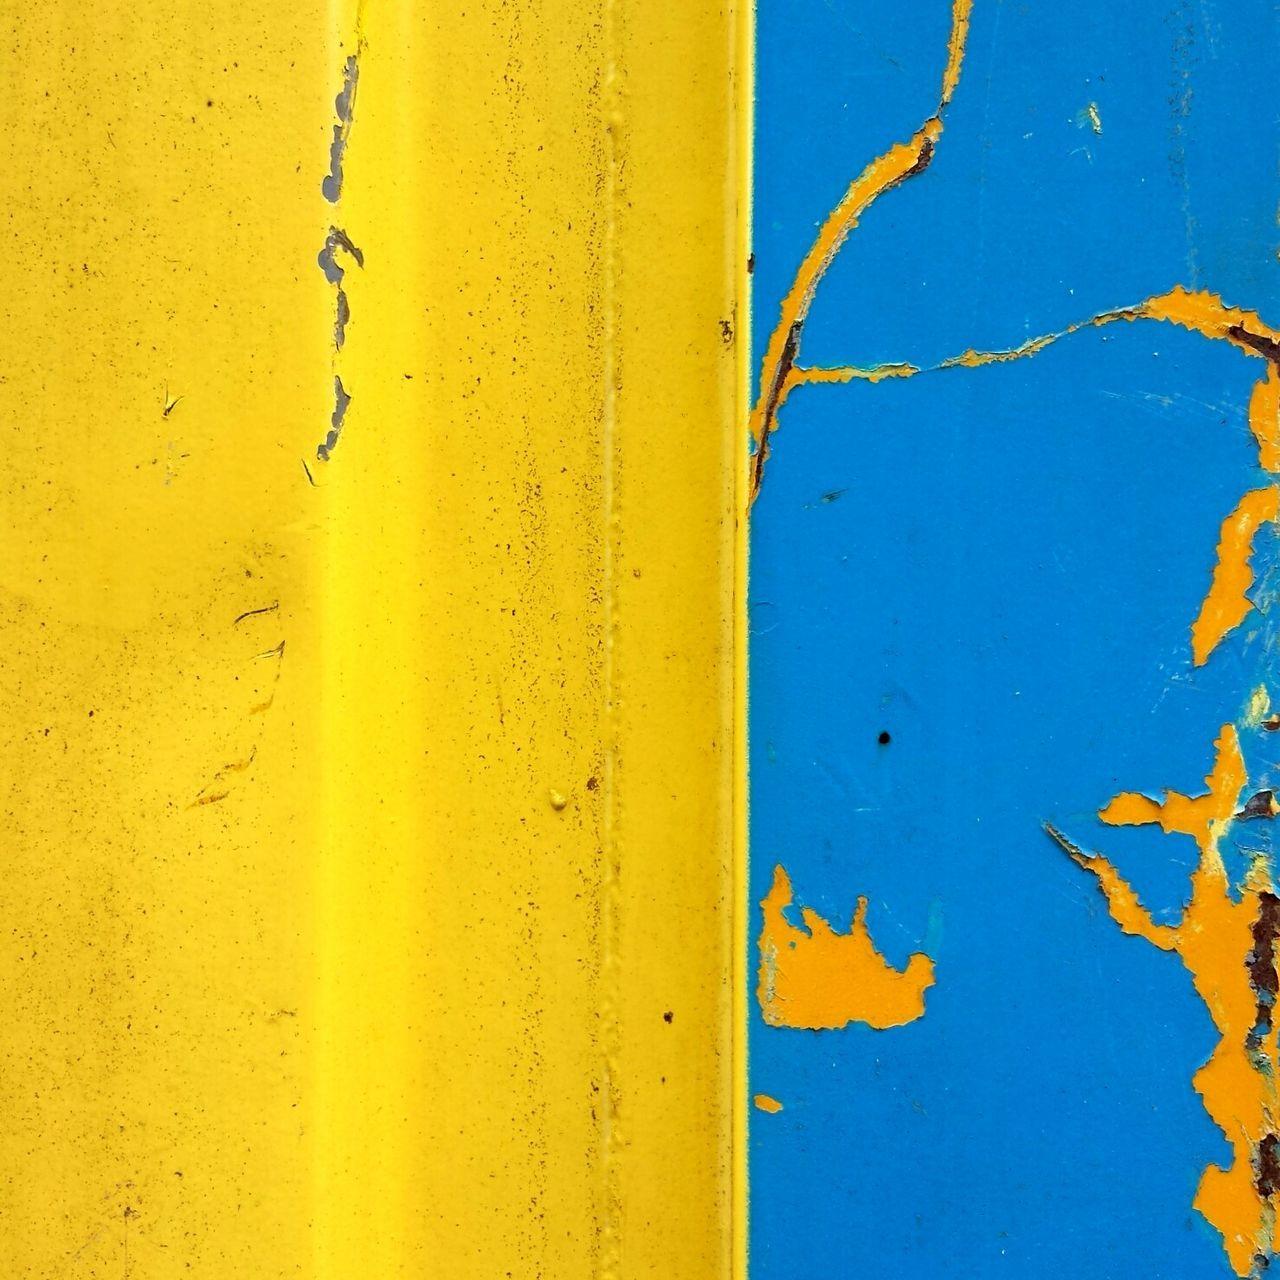 Dumpster Paint Decay Accidental Art Unintentional Art Abstract Accidentalart Unintentionalart